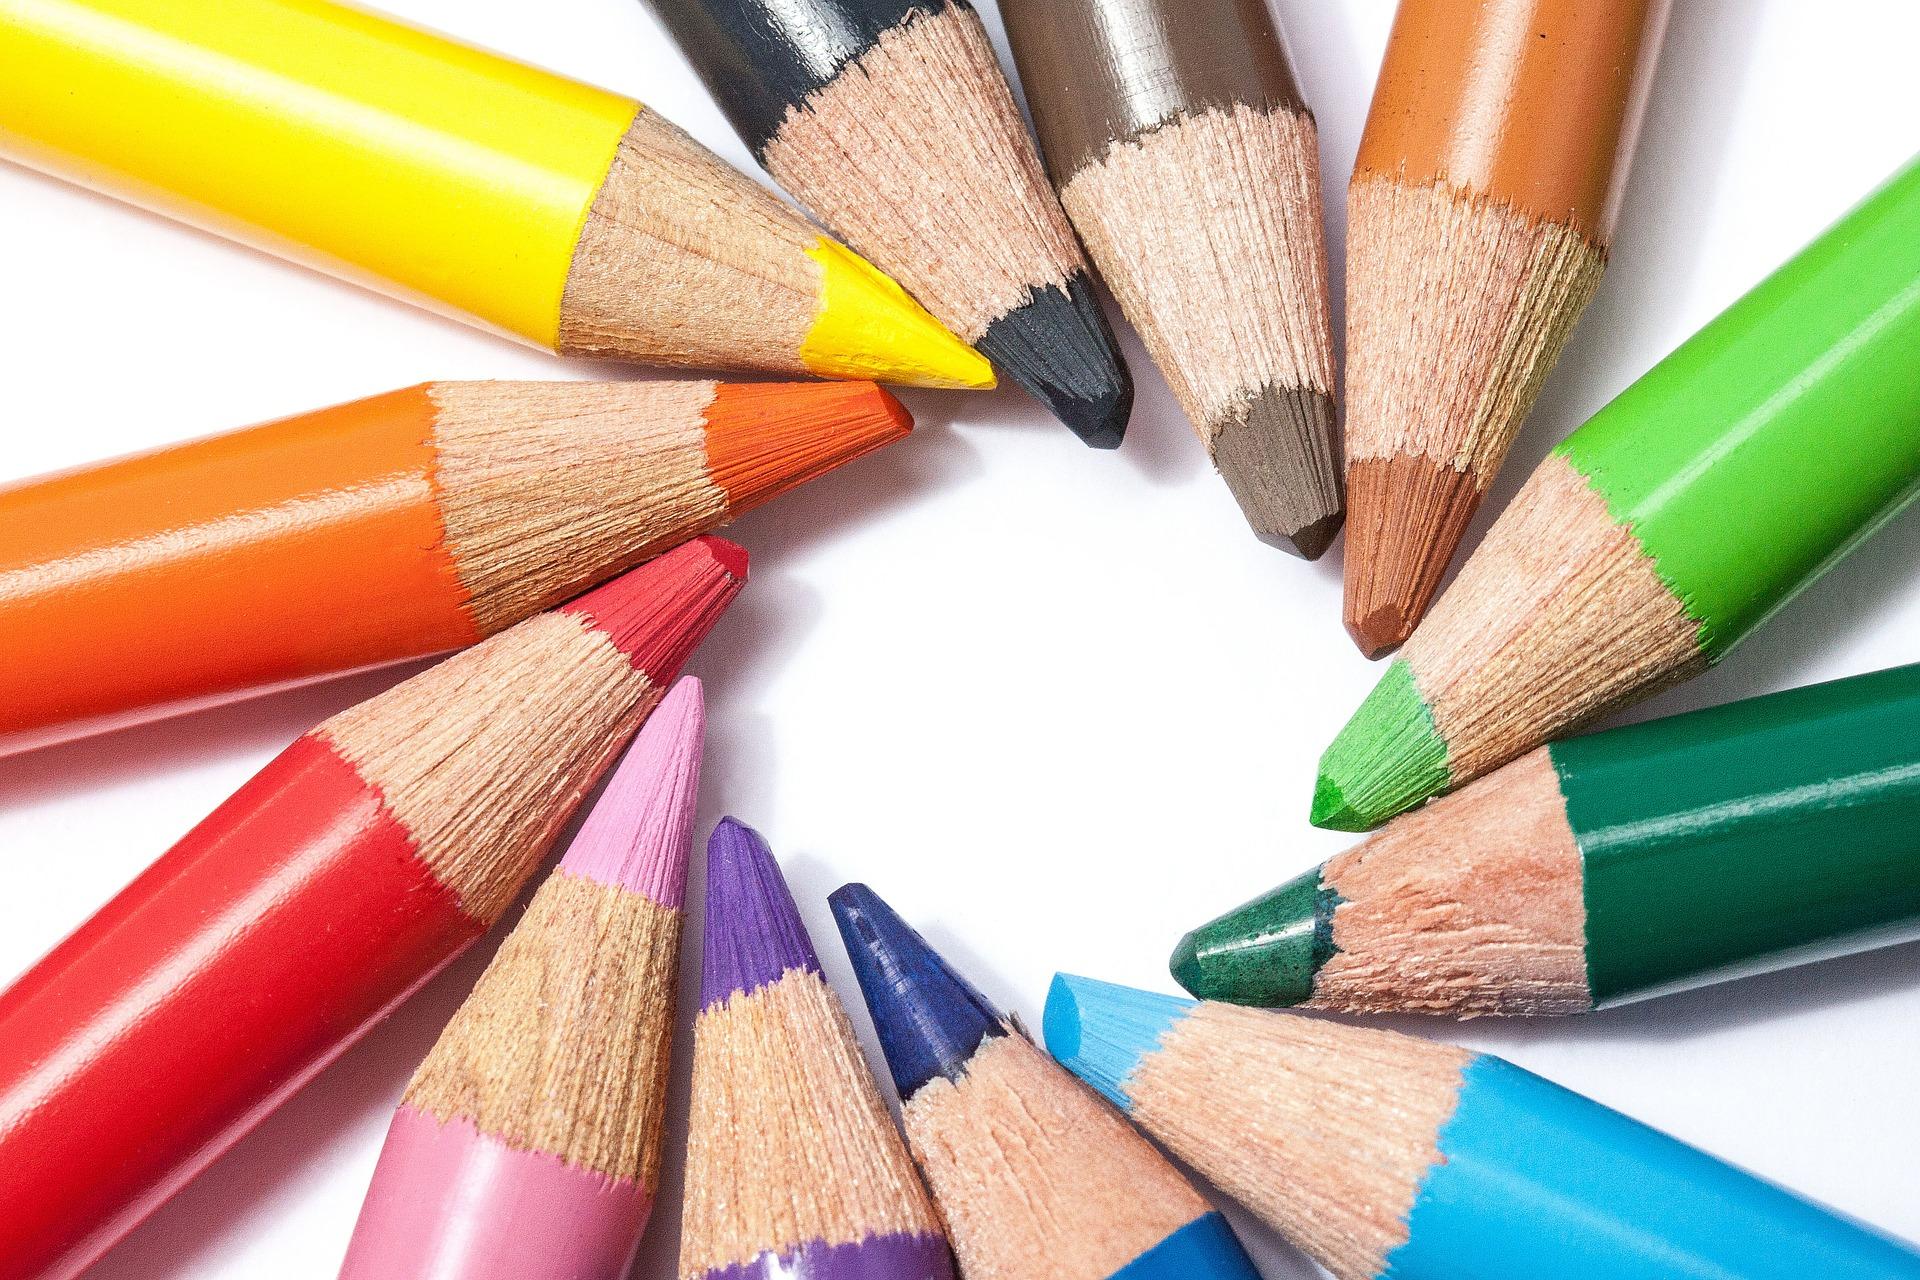 colored-pencils-374147_1920